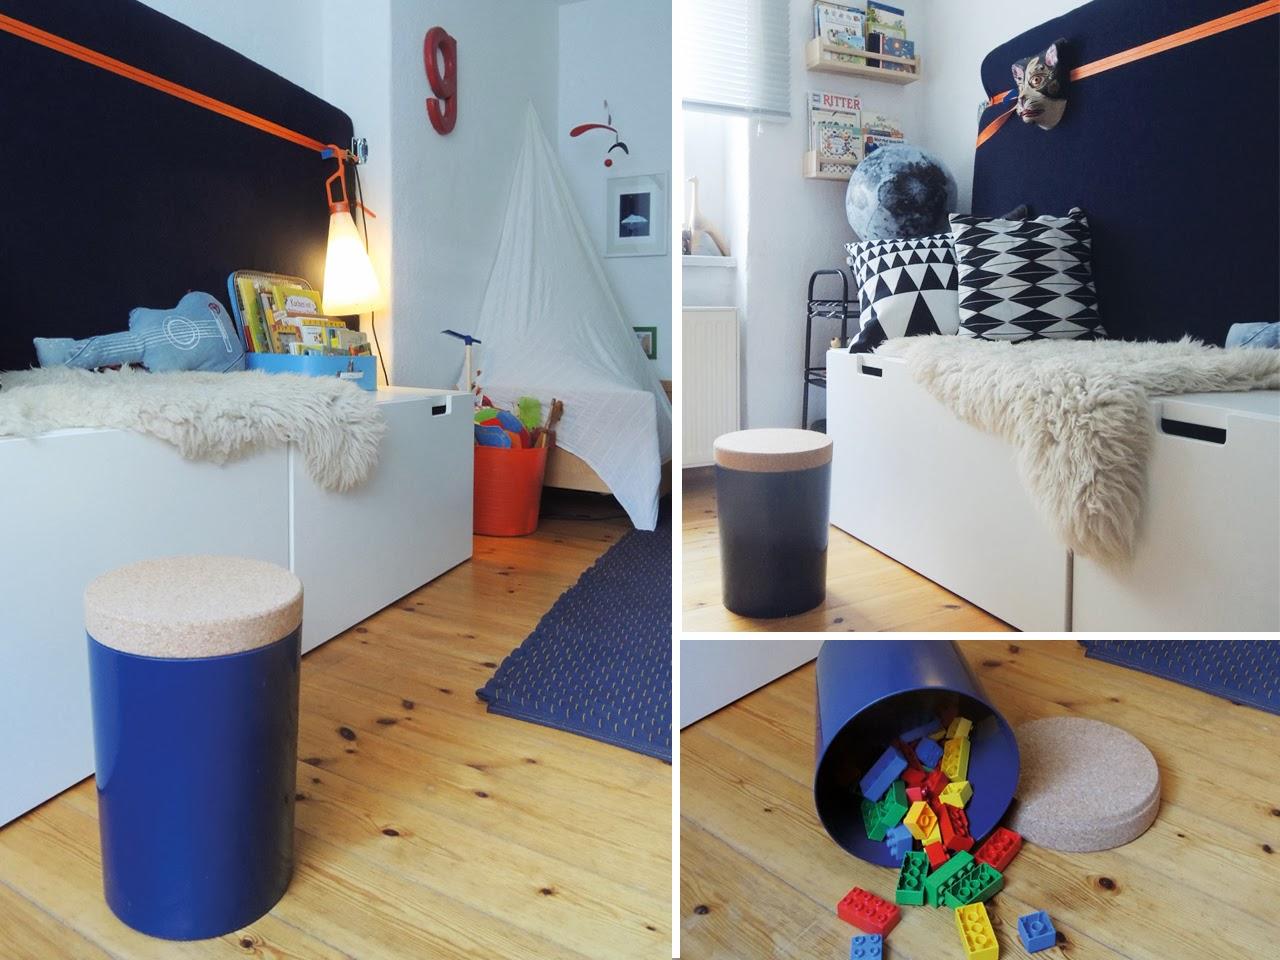 held lykke neuzug nge. Black Bedroom Furniture Sets. Home Design Ideas